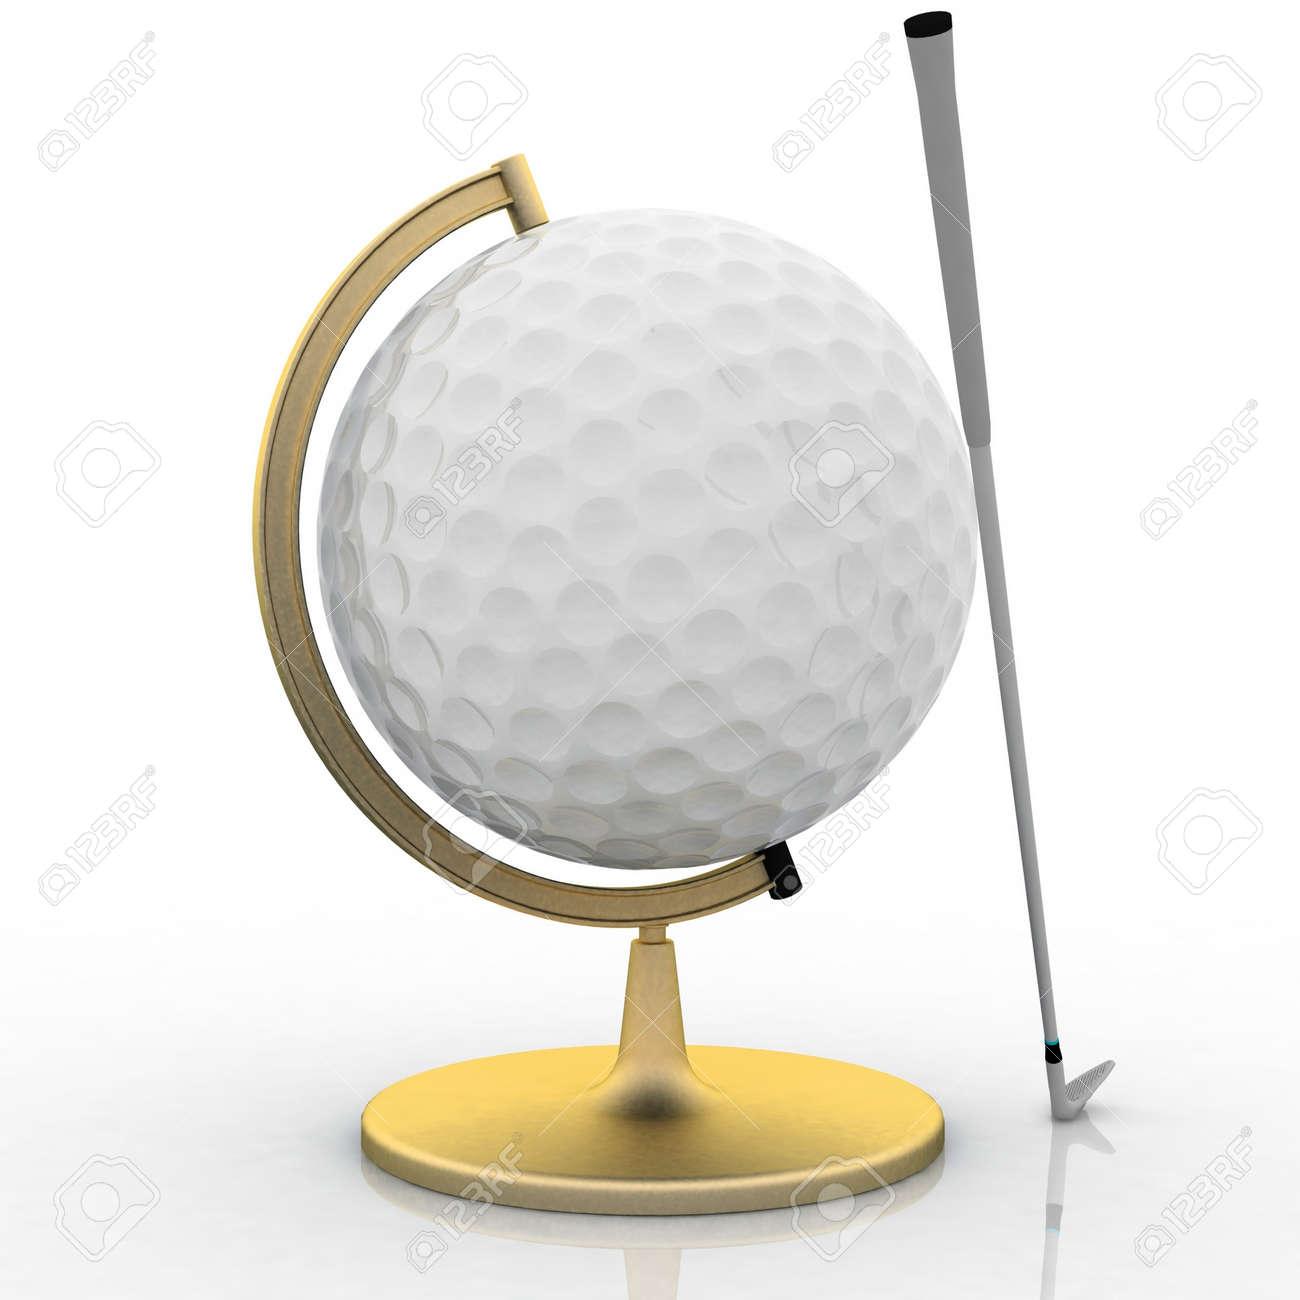 globe golf ball sign Stock Photo - 12050463